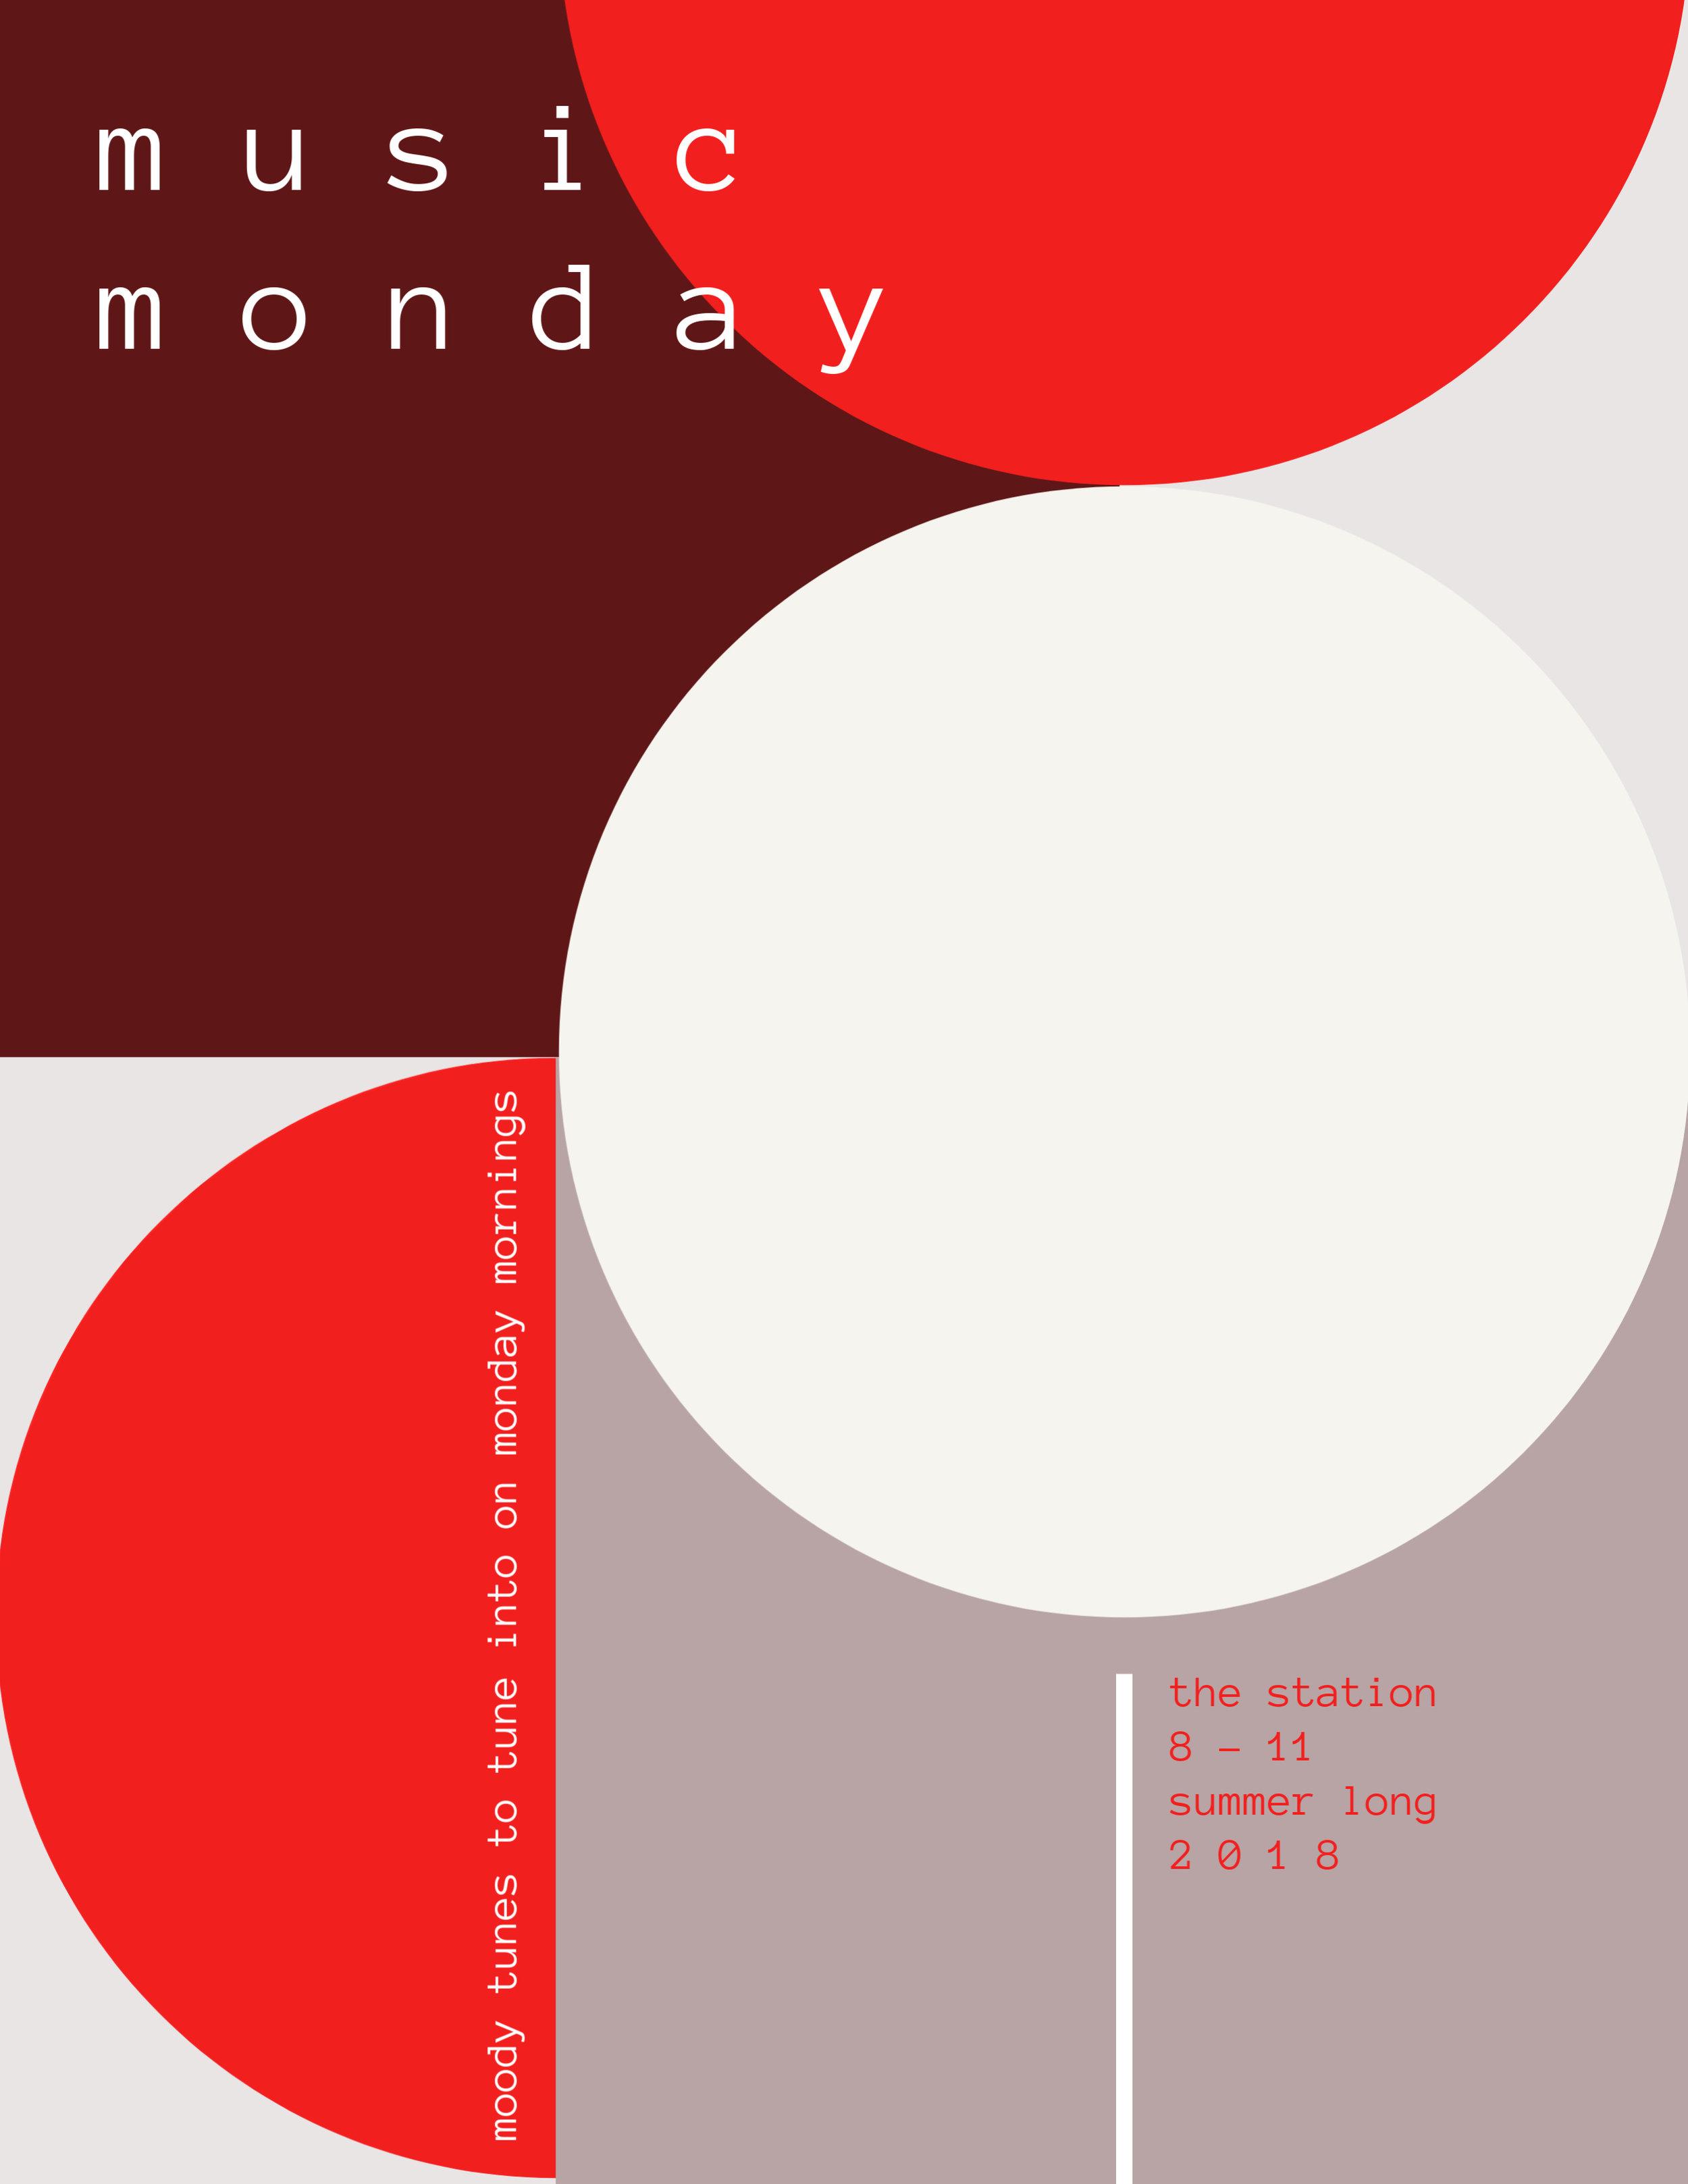 music monday poster.jpg